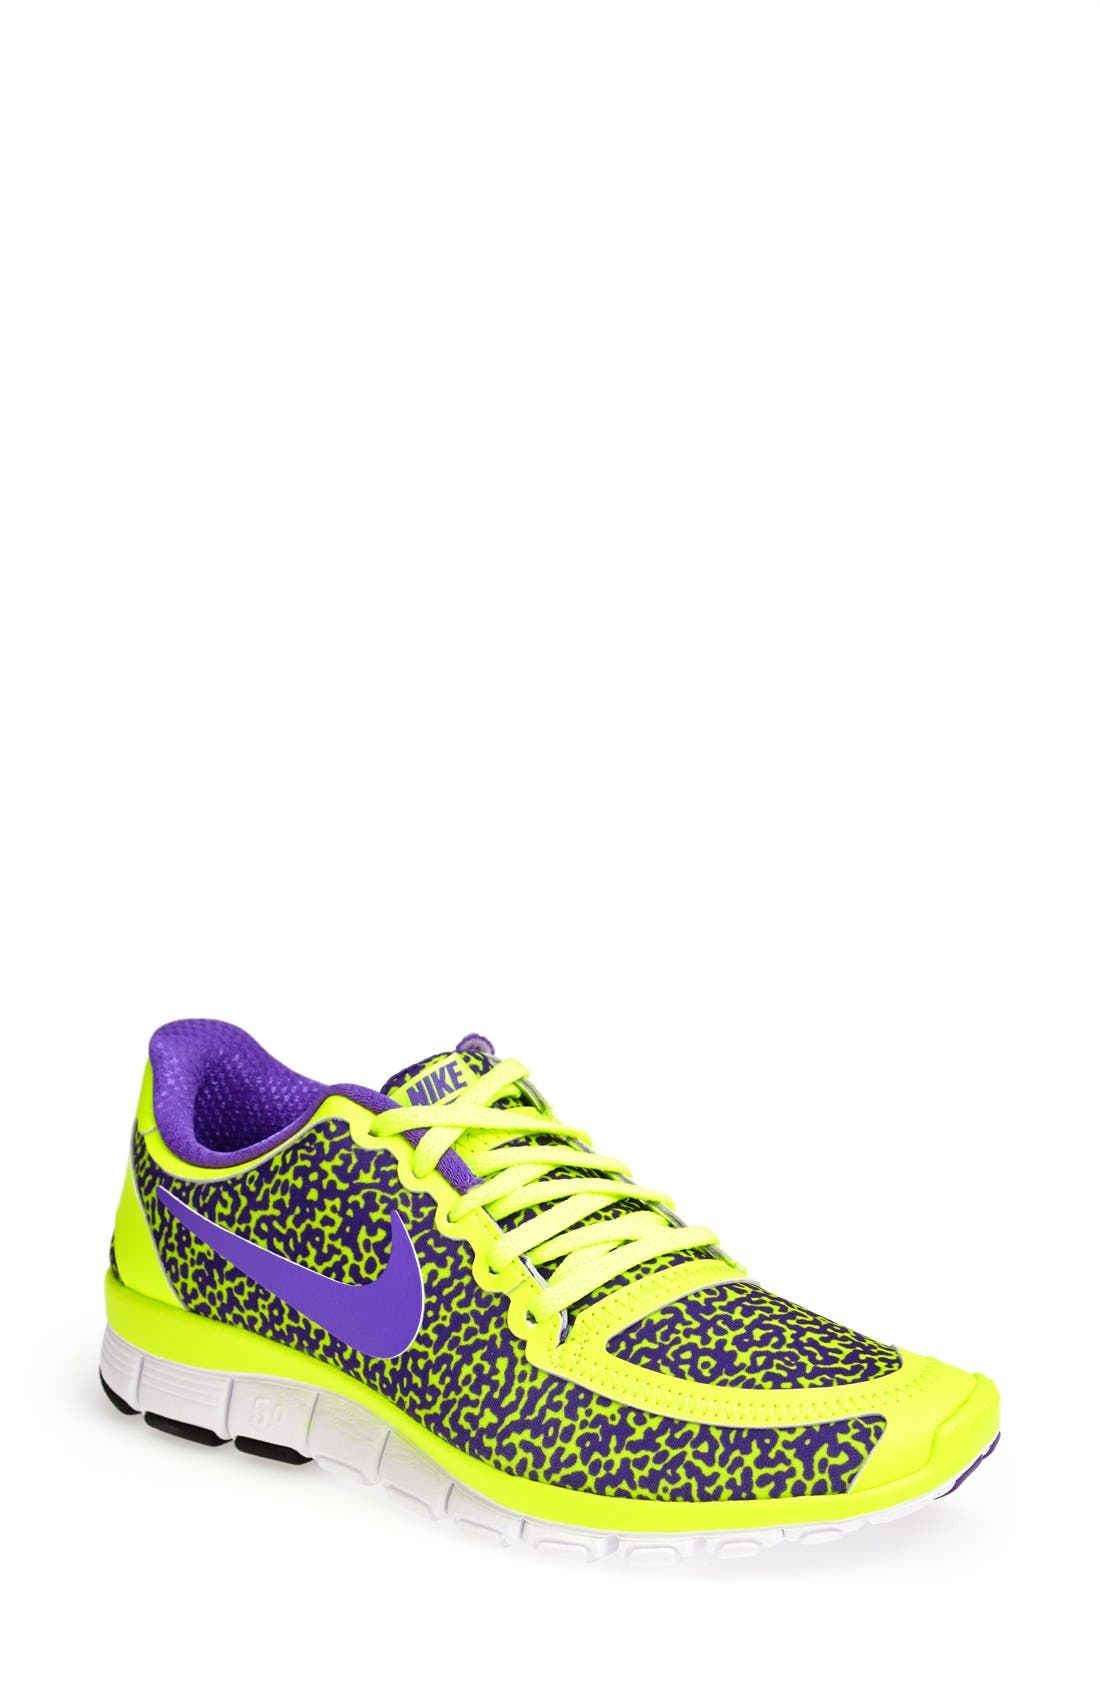 Nike Store Gratuit Nordstrom Léopard 5,0 V4